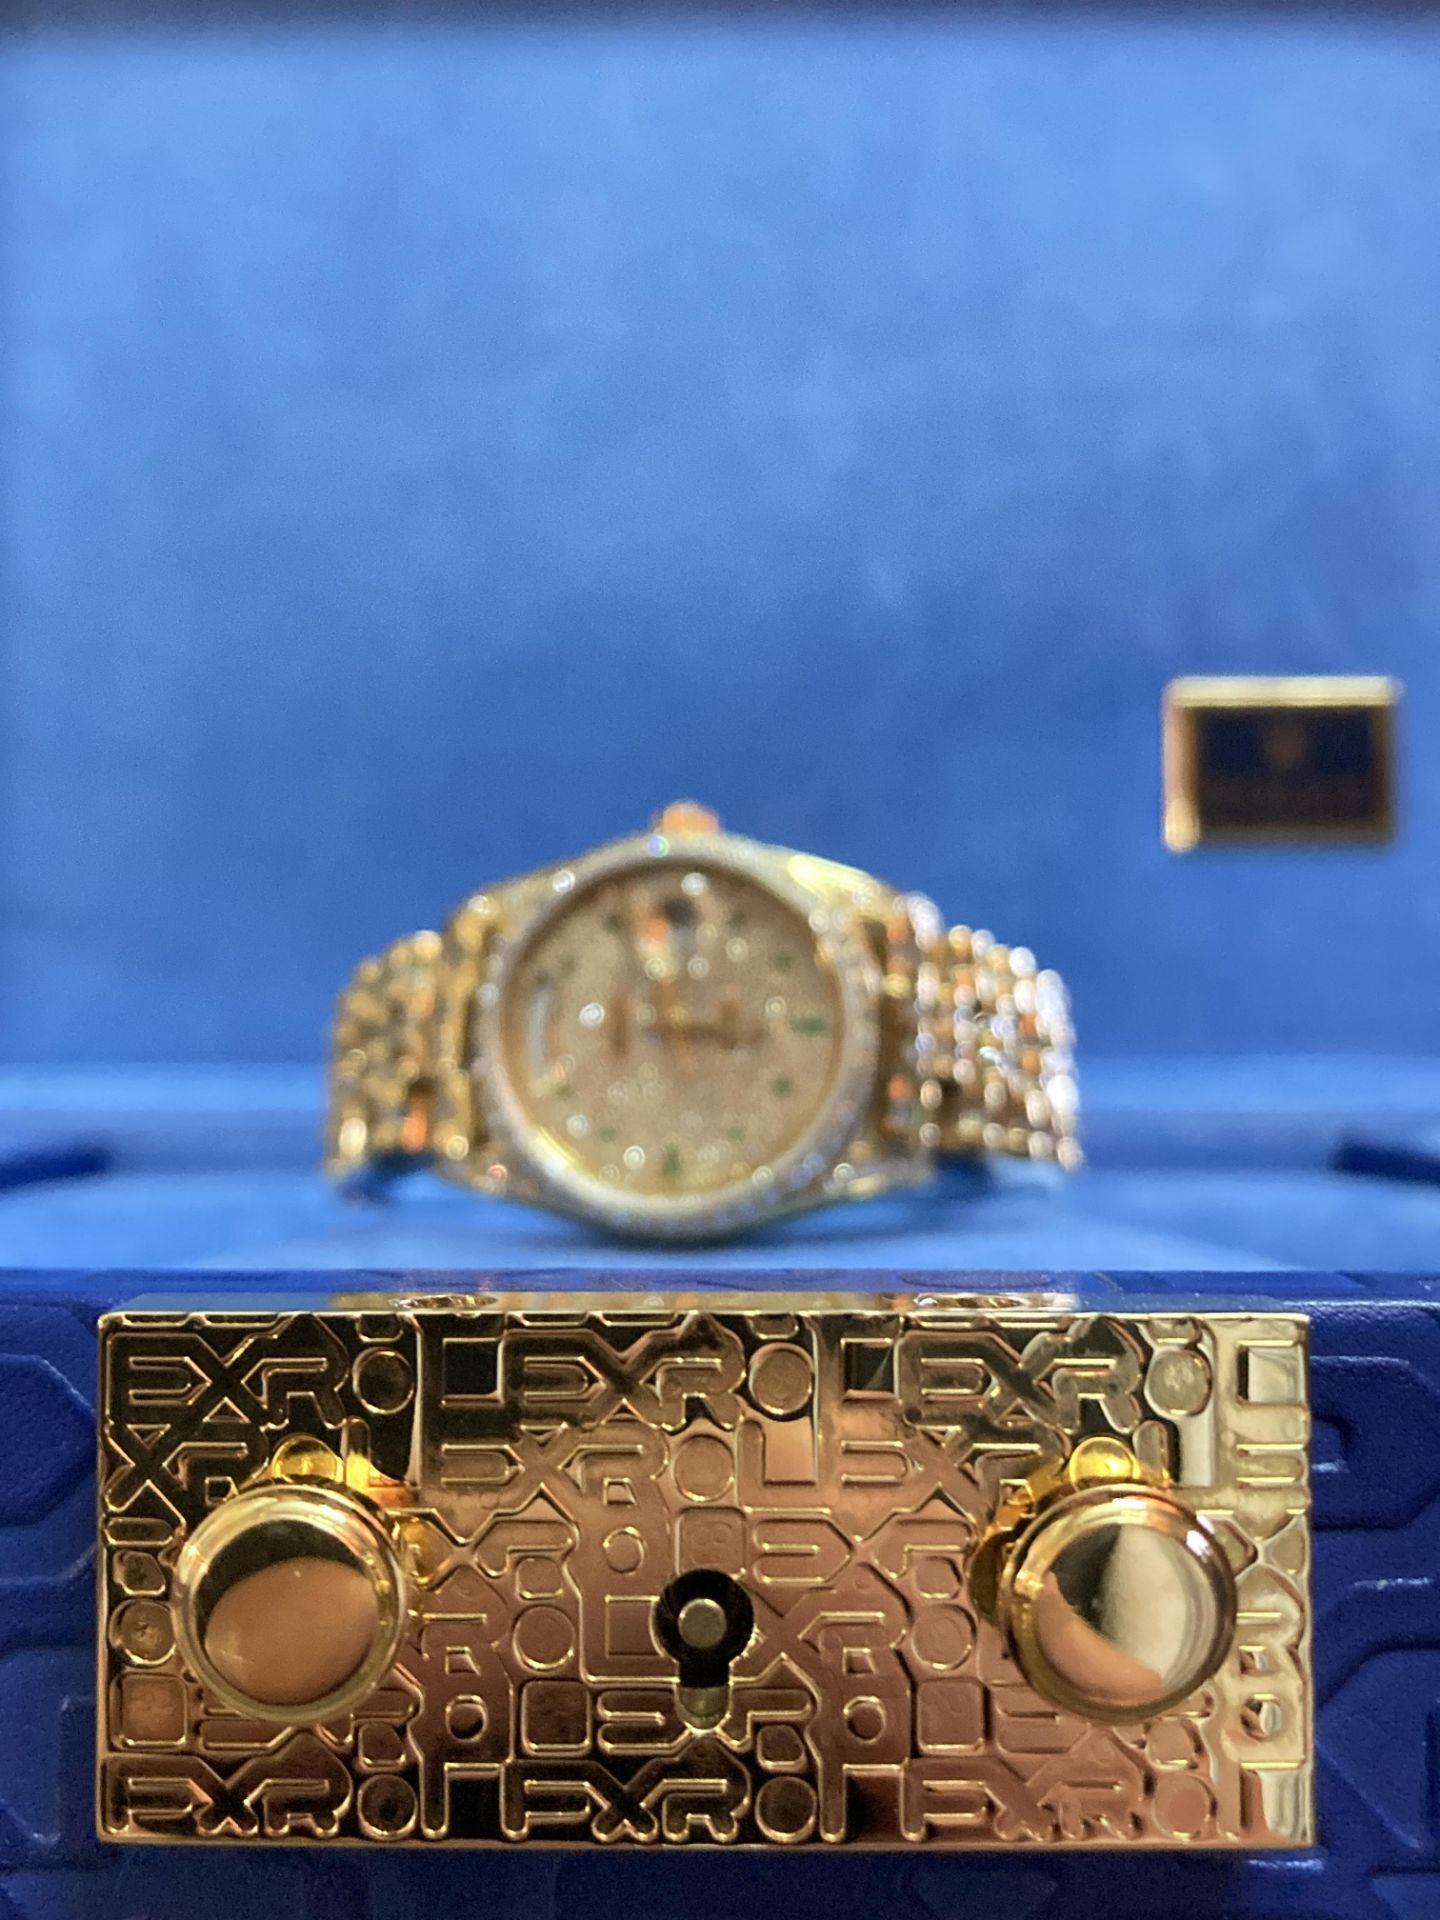 GENTS 36mm ROLEX DAYDATE YELLOW GOLD DIAMOND WATCH - Image 10 of 21